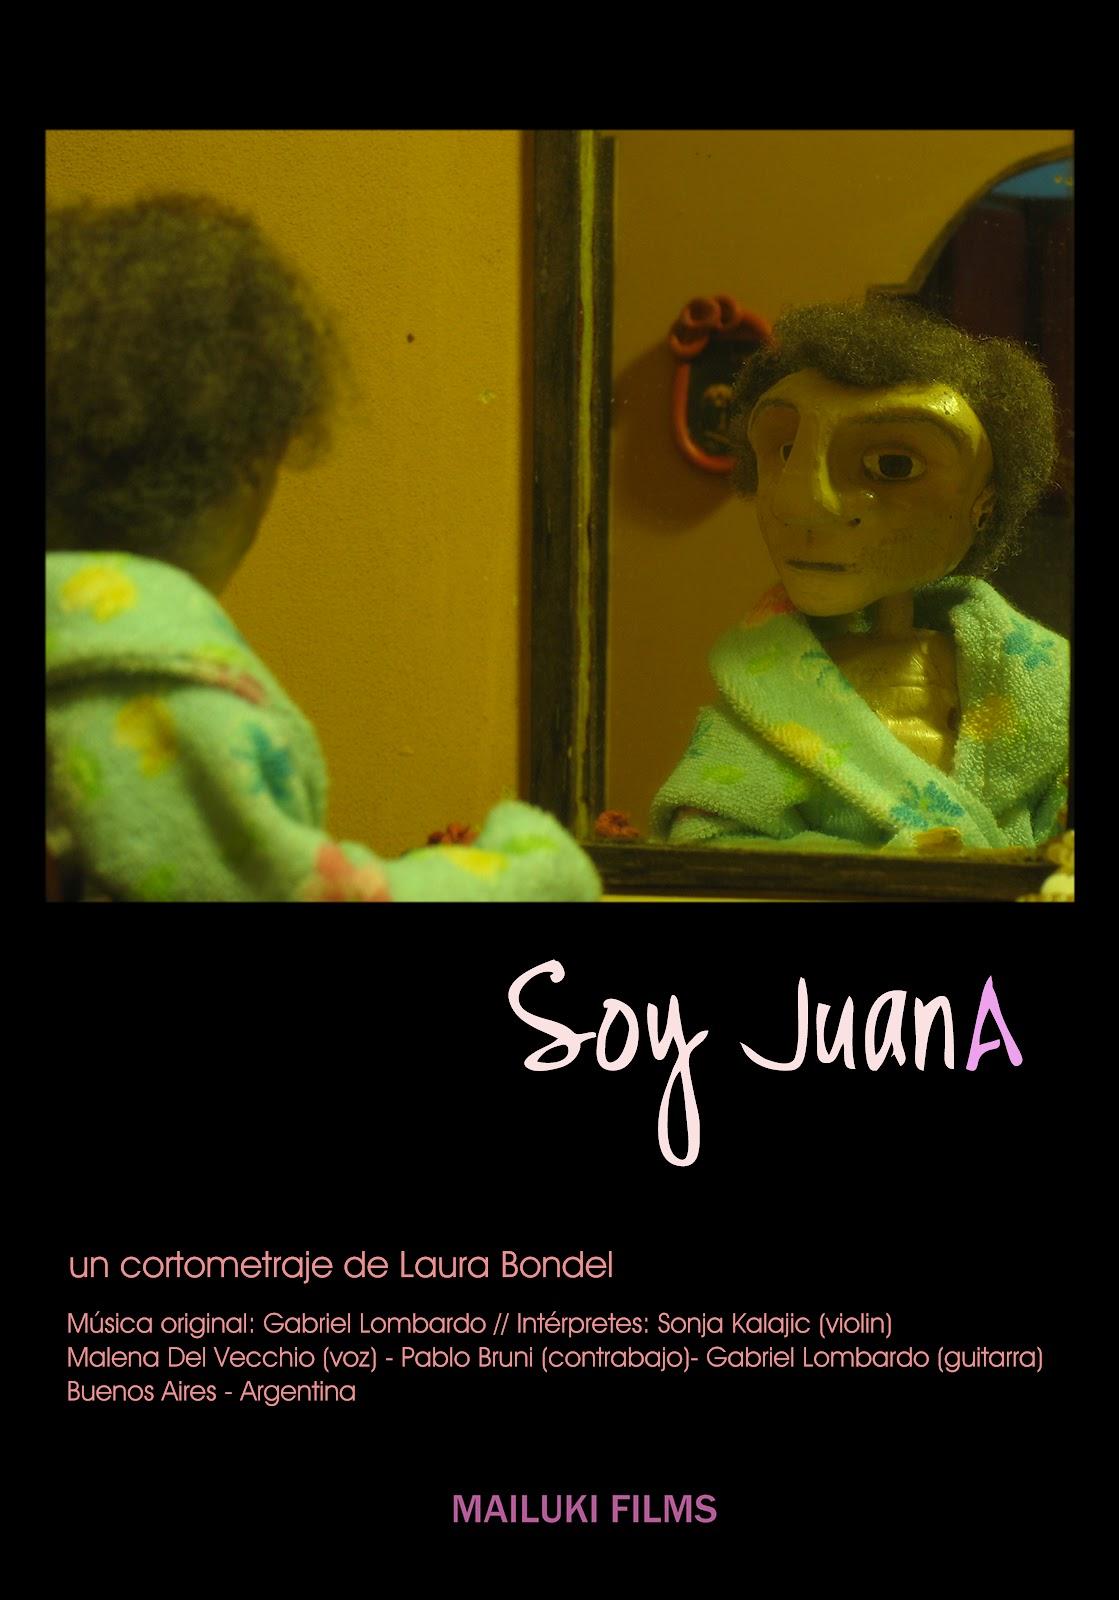 poster SoyJuanA (en alta - sin fecha)